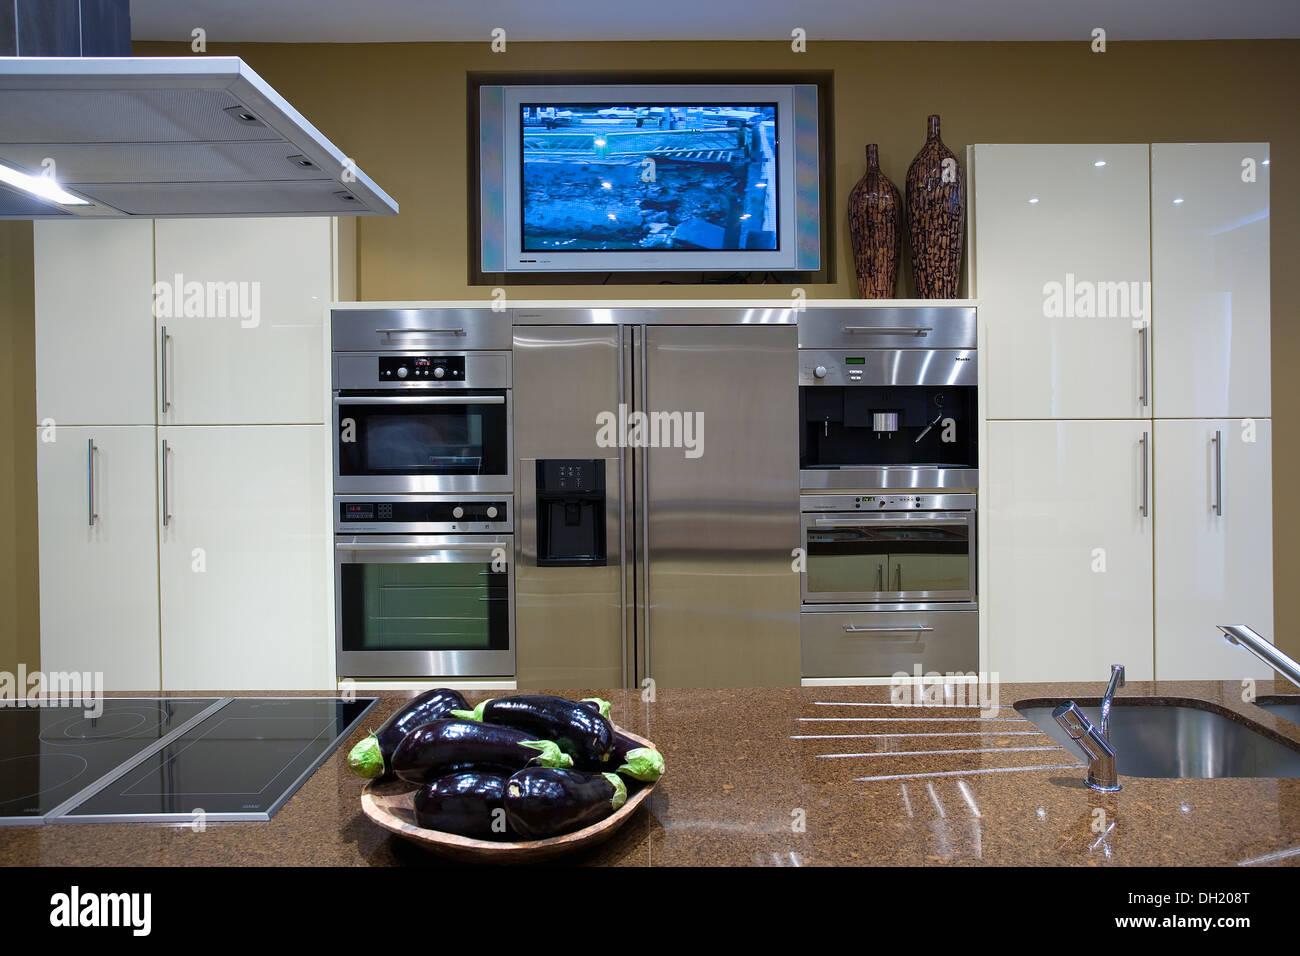 Oven Hob In Island Unit Stockfotos & Oven Hob In Island Unit Bilder ...